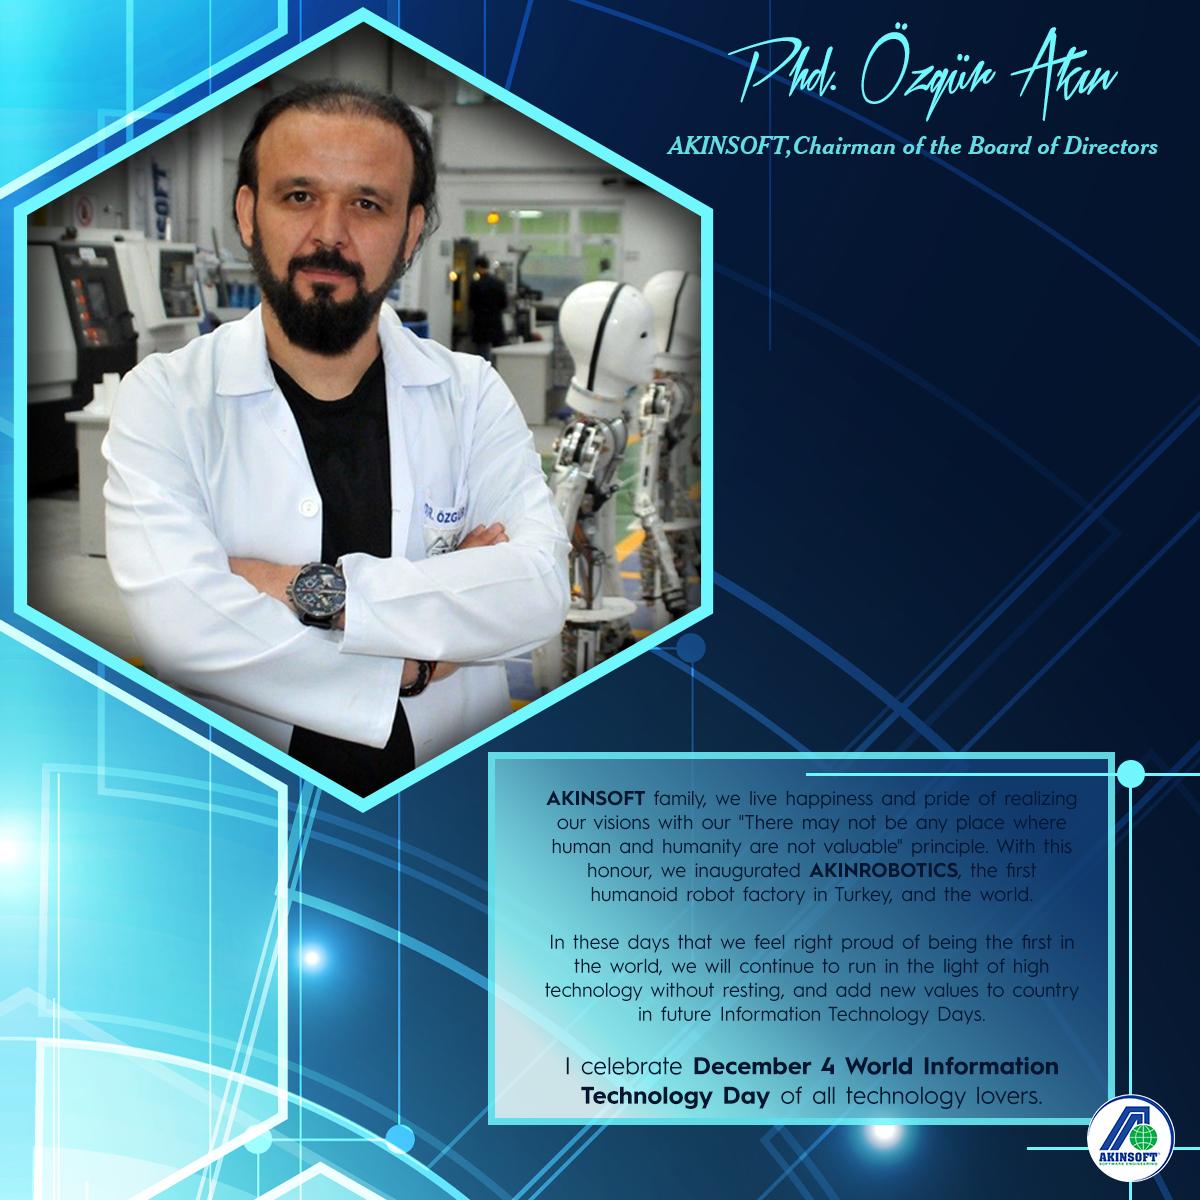 AKINSOFT Chairman of the Executive Board Özgür AKIN PhD Celebration Message of World Information Technology Day